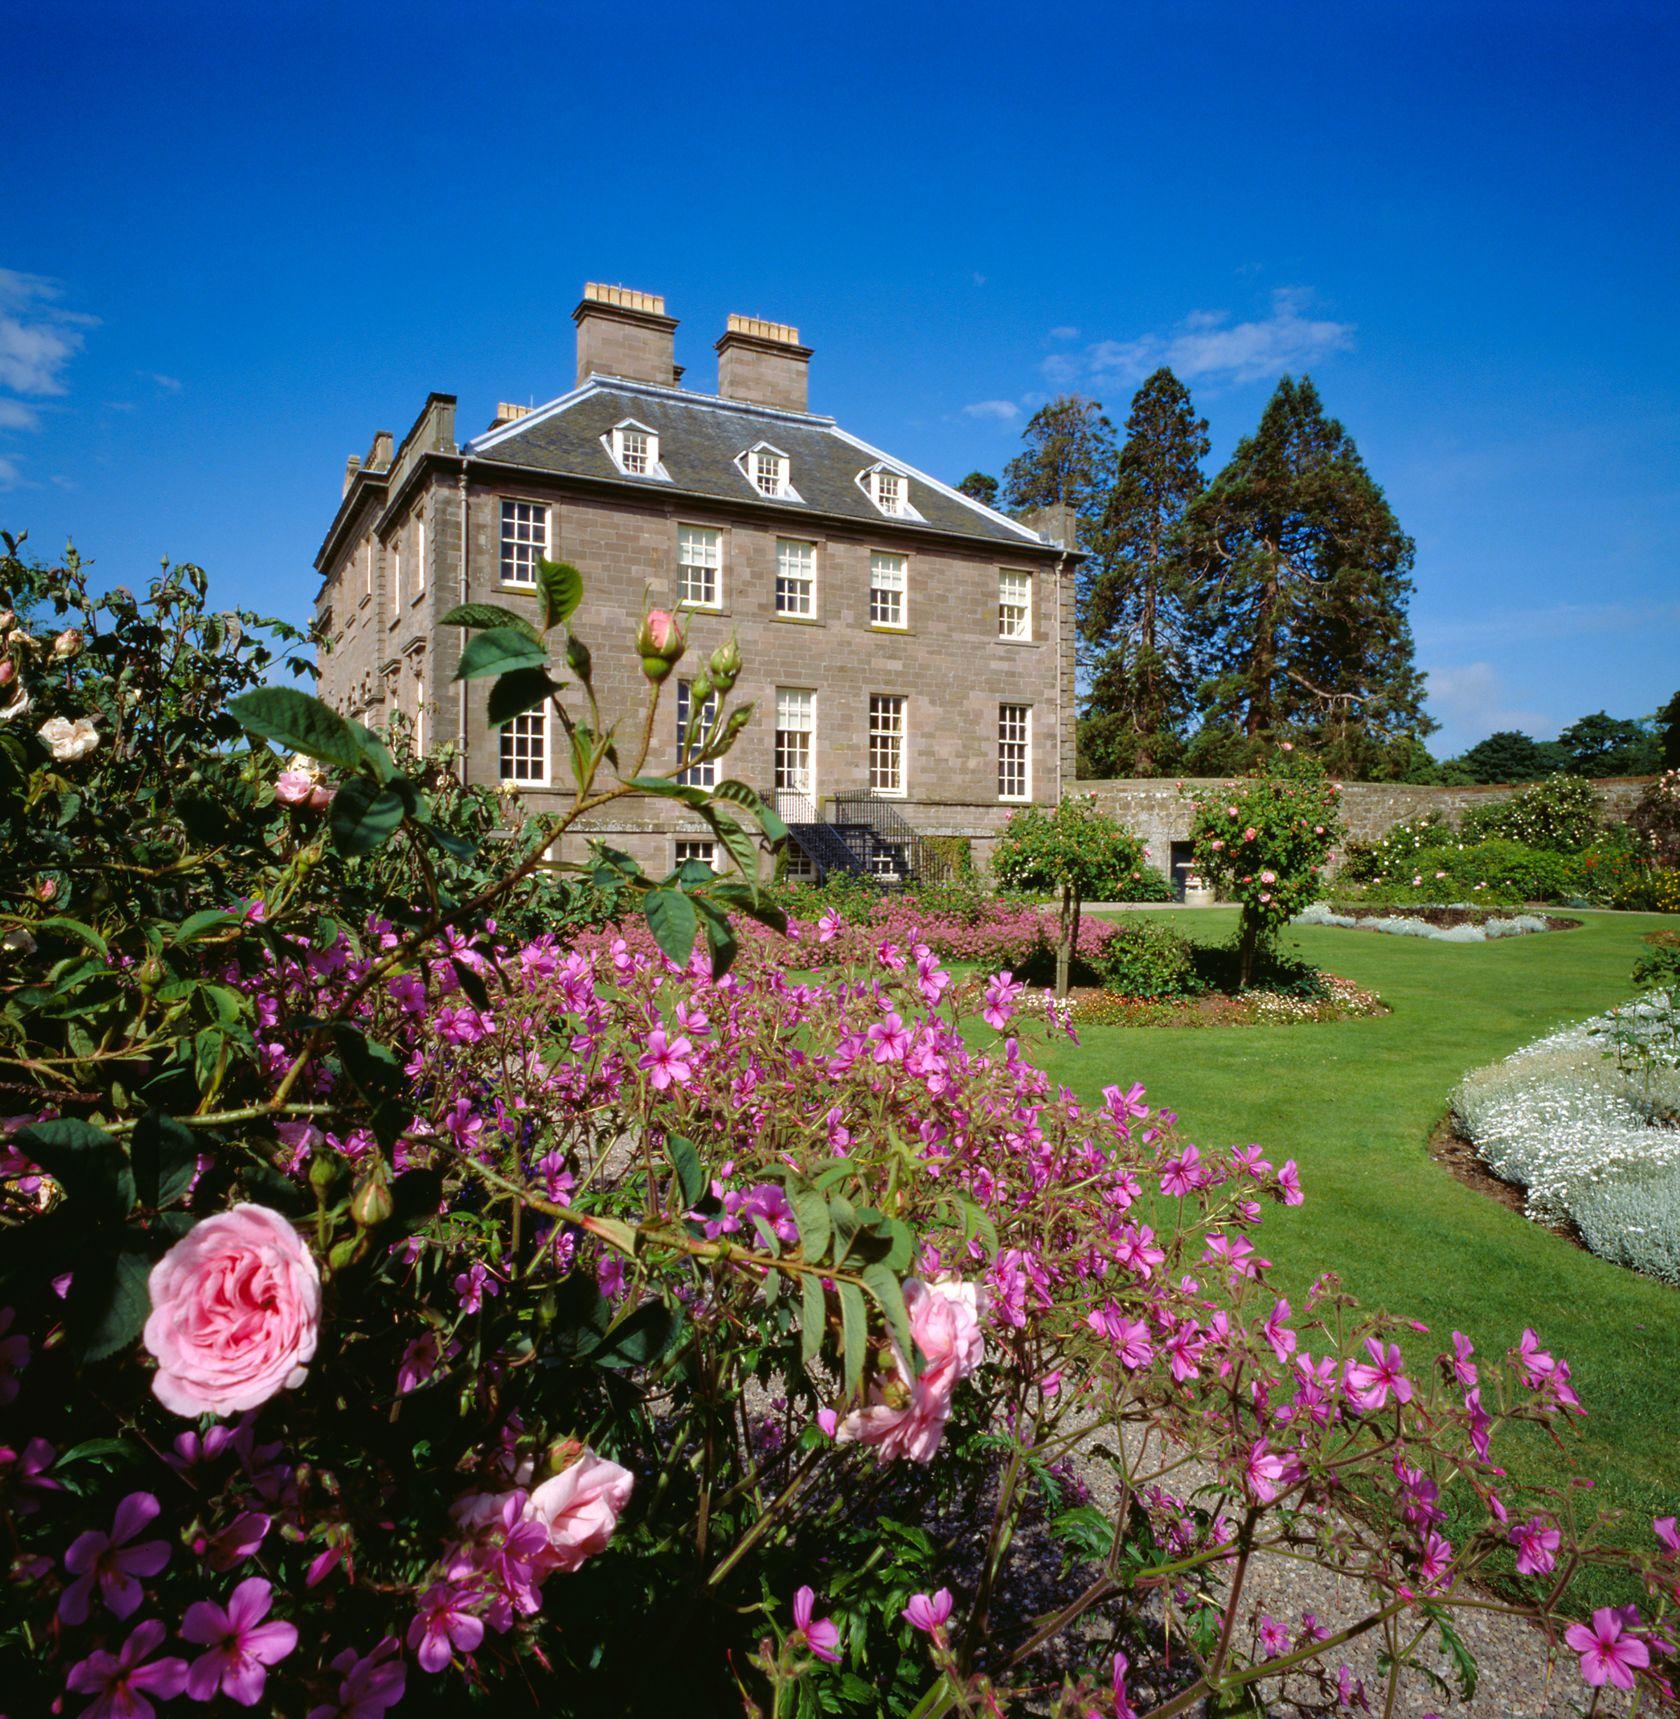 House of Dun, Montrose, Angus Chester hotel, Scottish